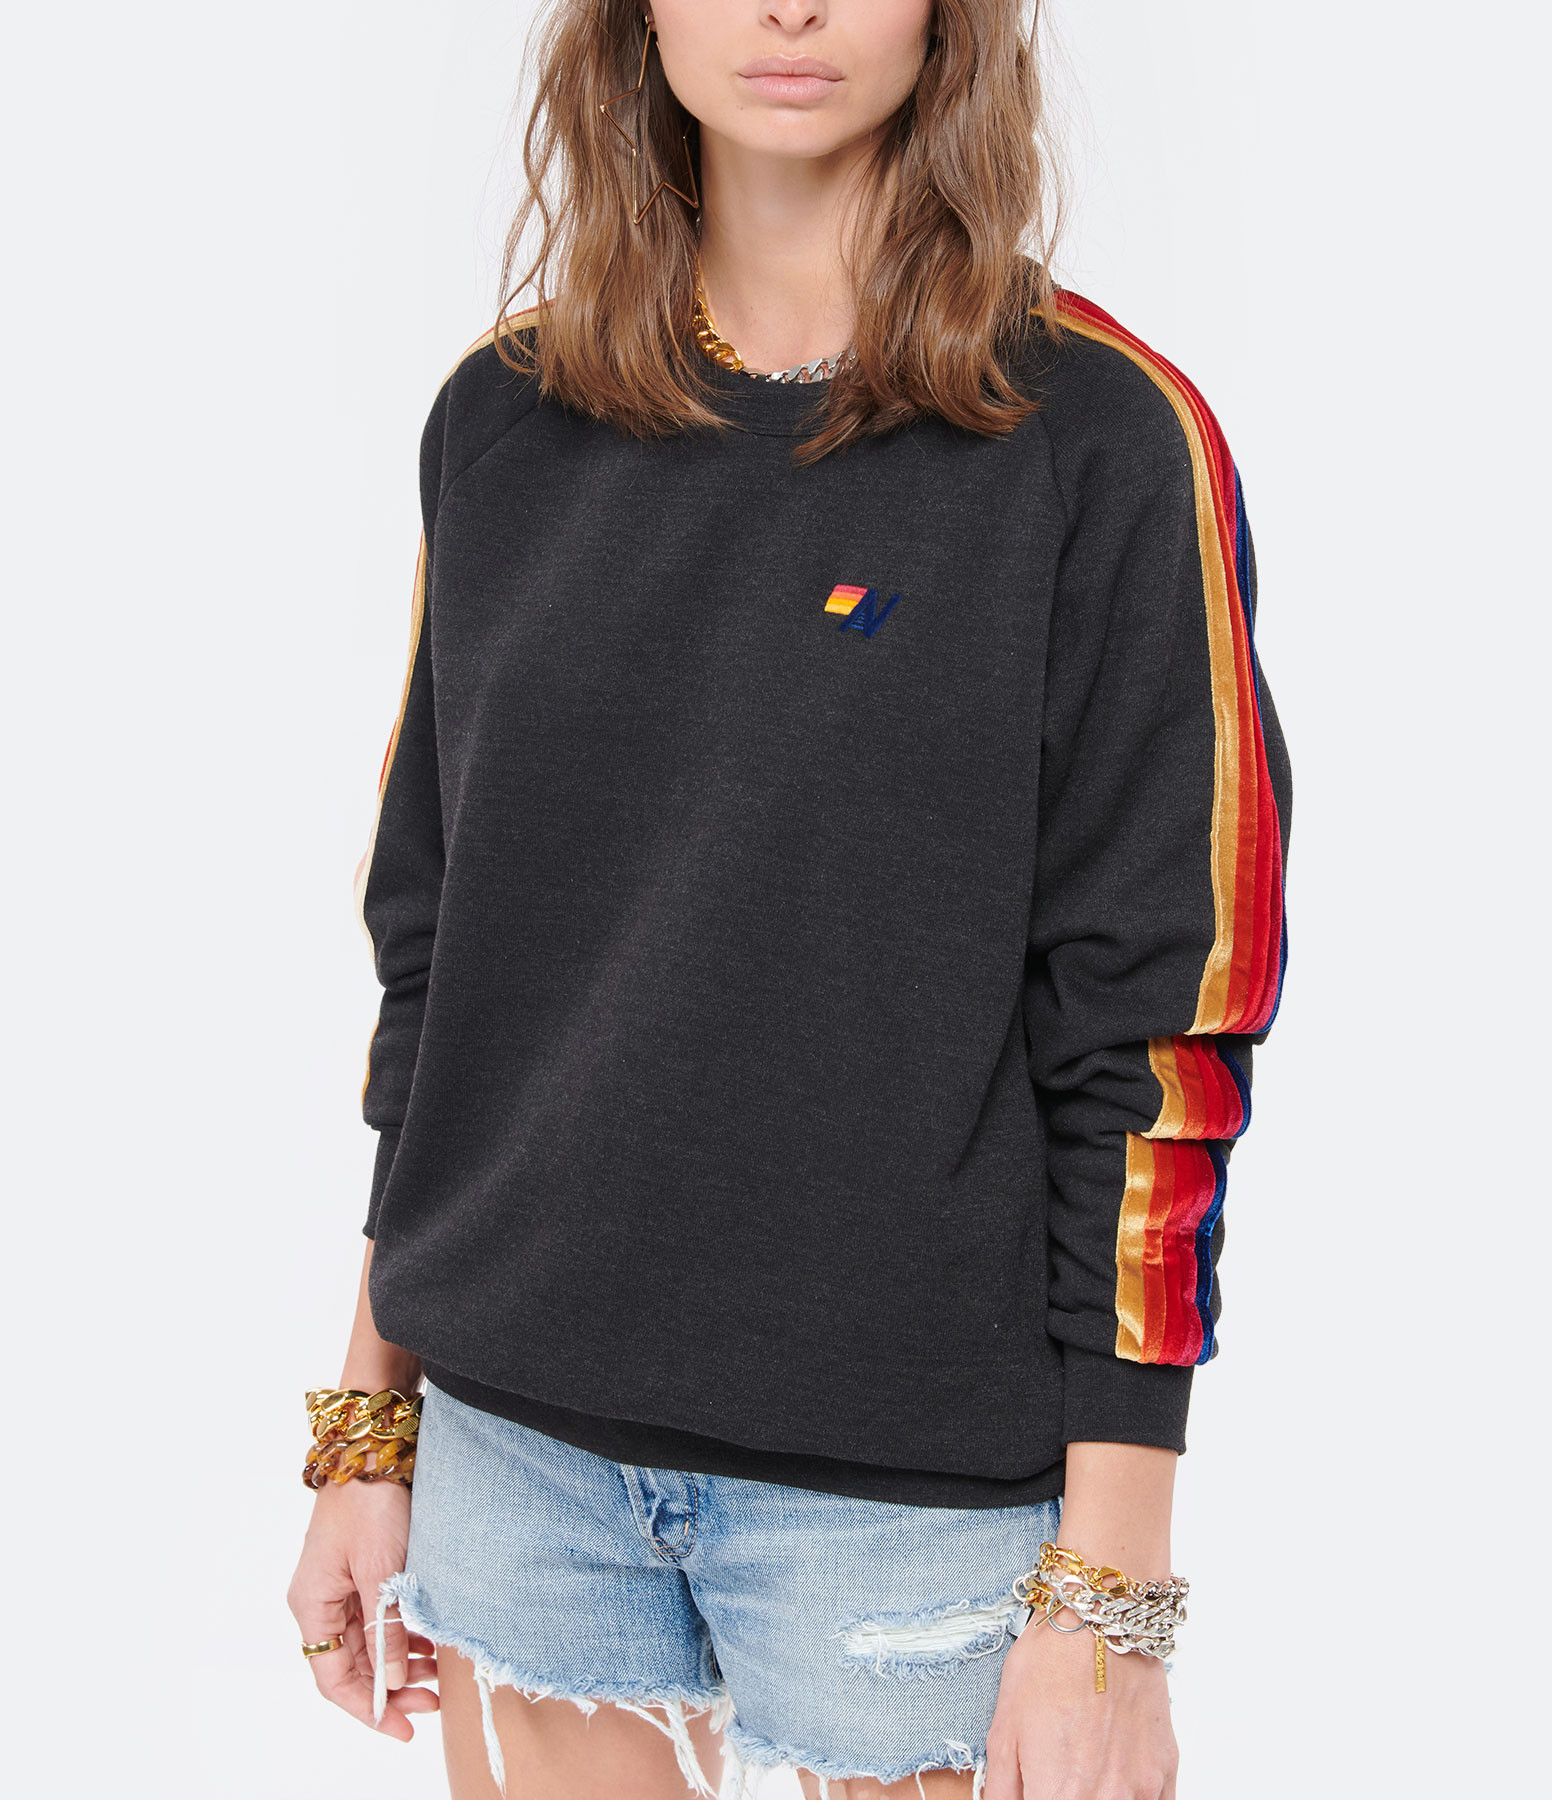 AVIATOR NATION - Sweatshirt Classic Rayures Noir